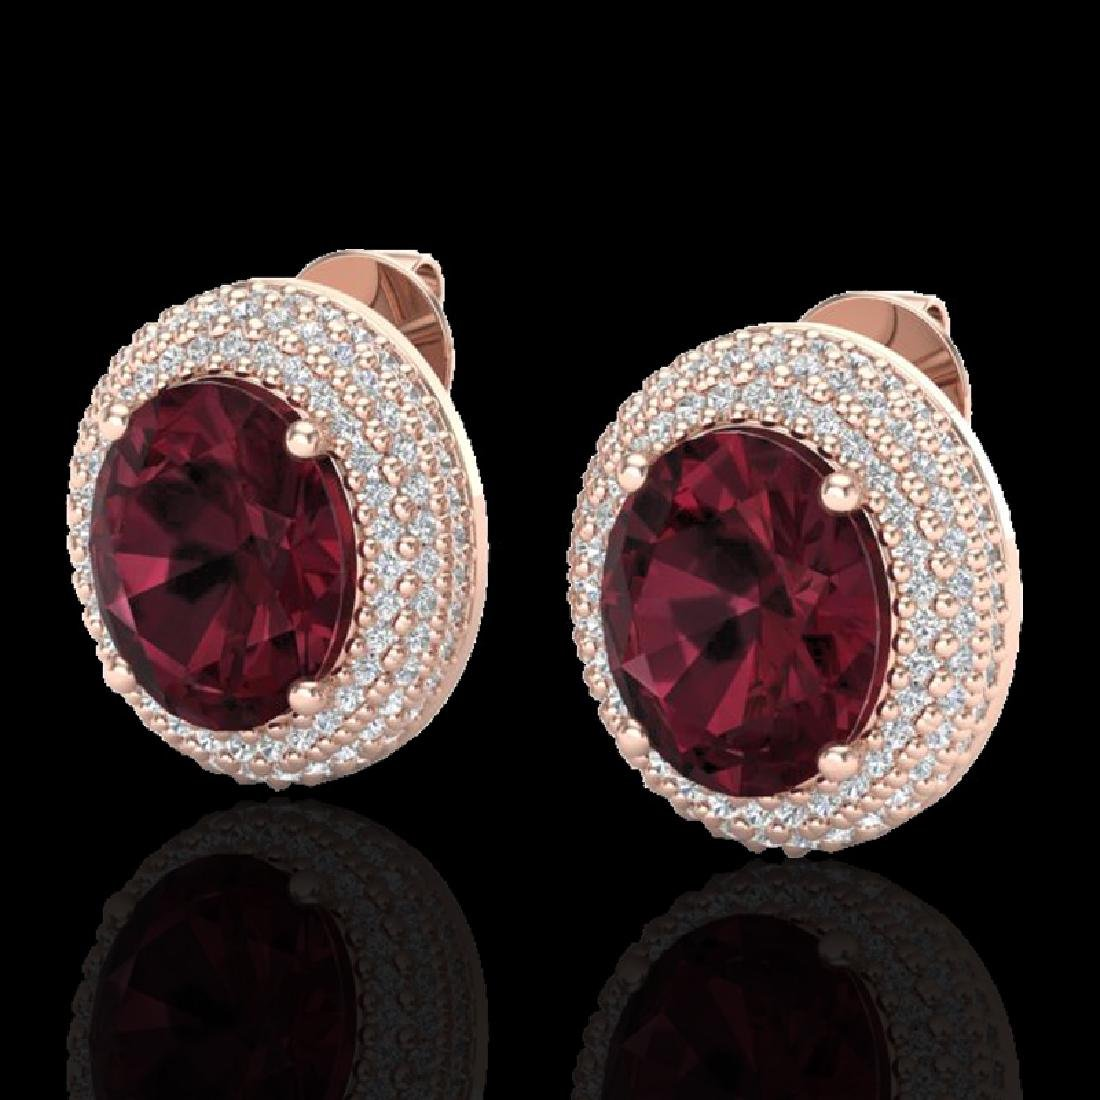 9 CTW Garnet & Micro Pave VS/SI Diamond Earrings 14K